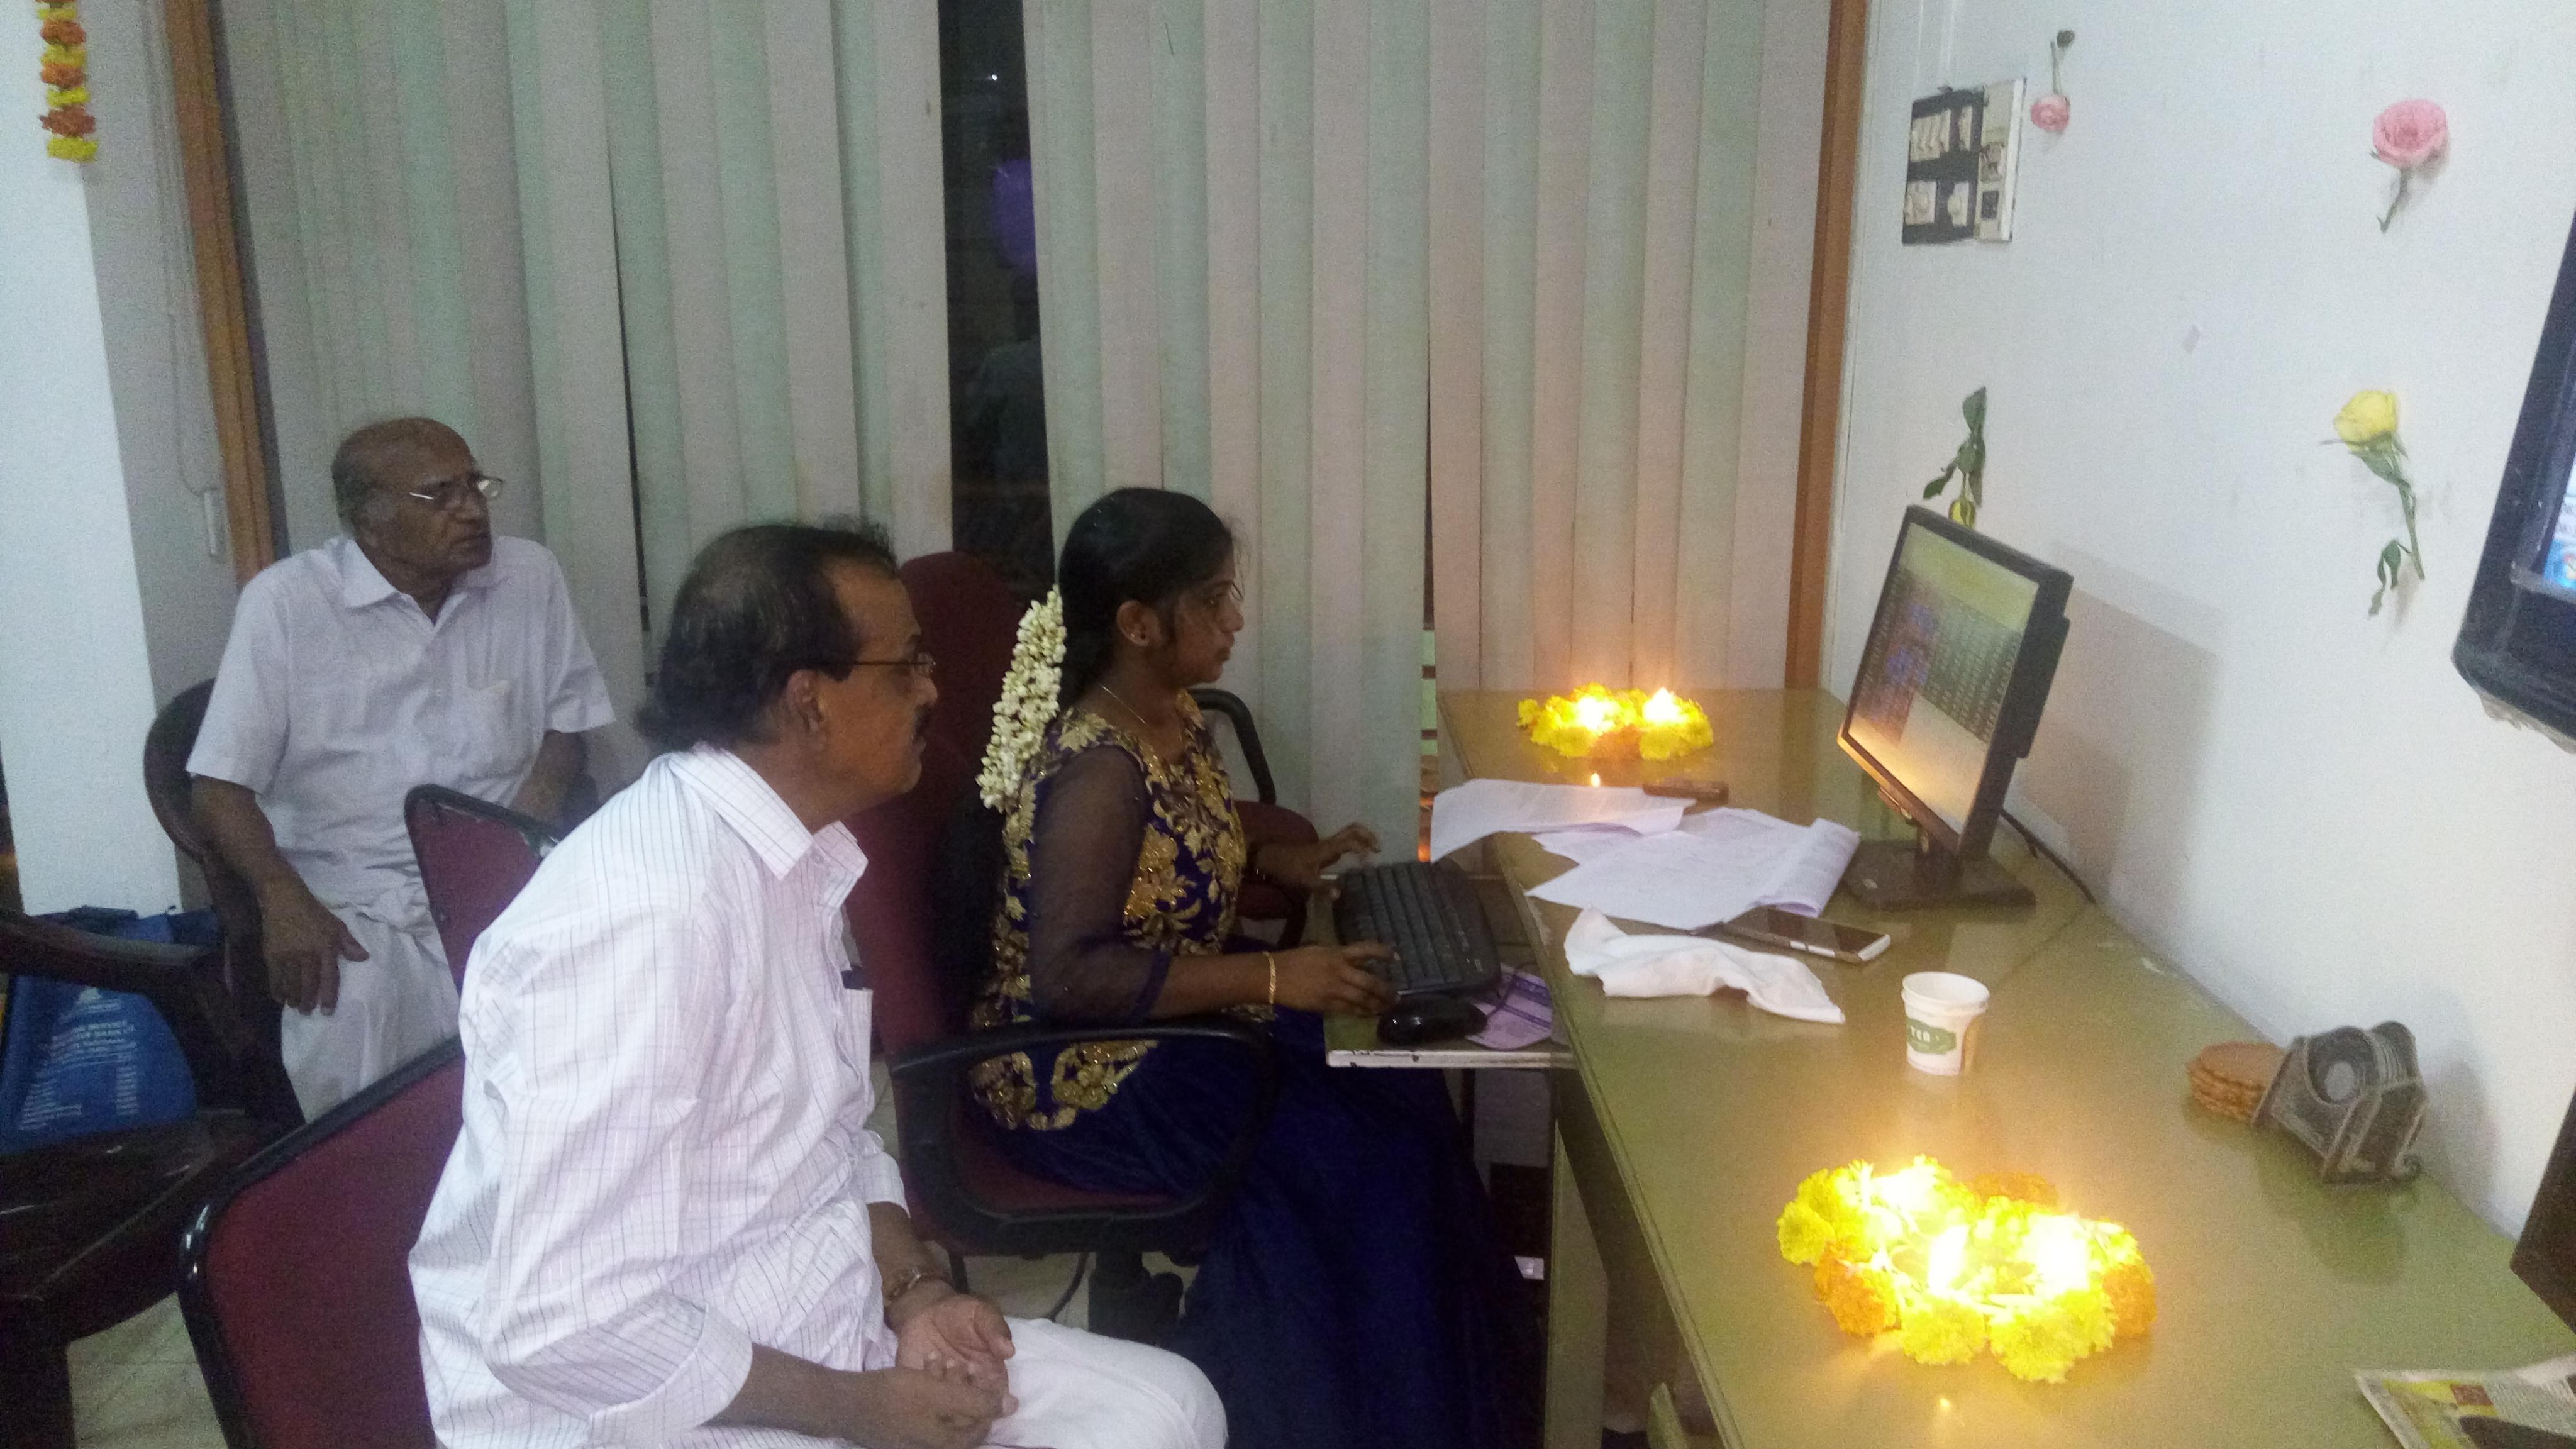 Sharekhan Ltd - Logans Road, Thalassery